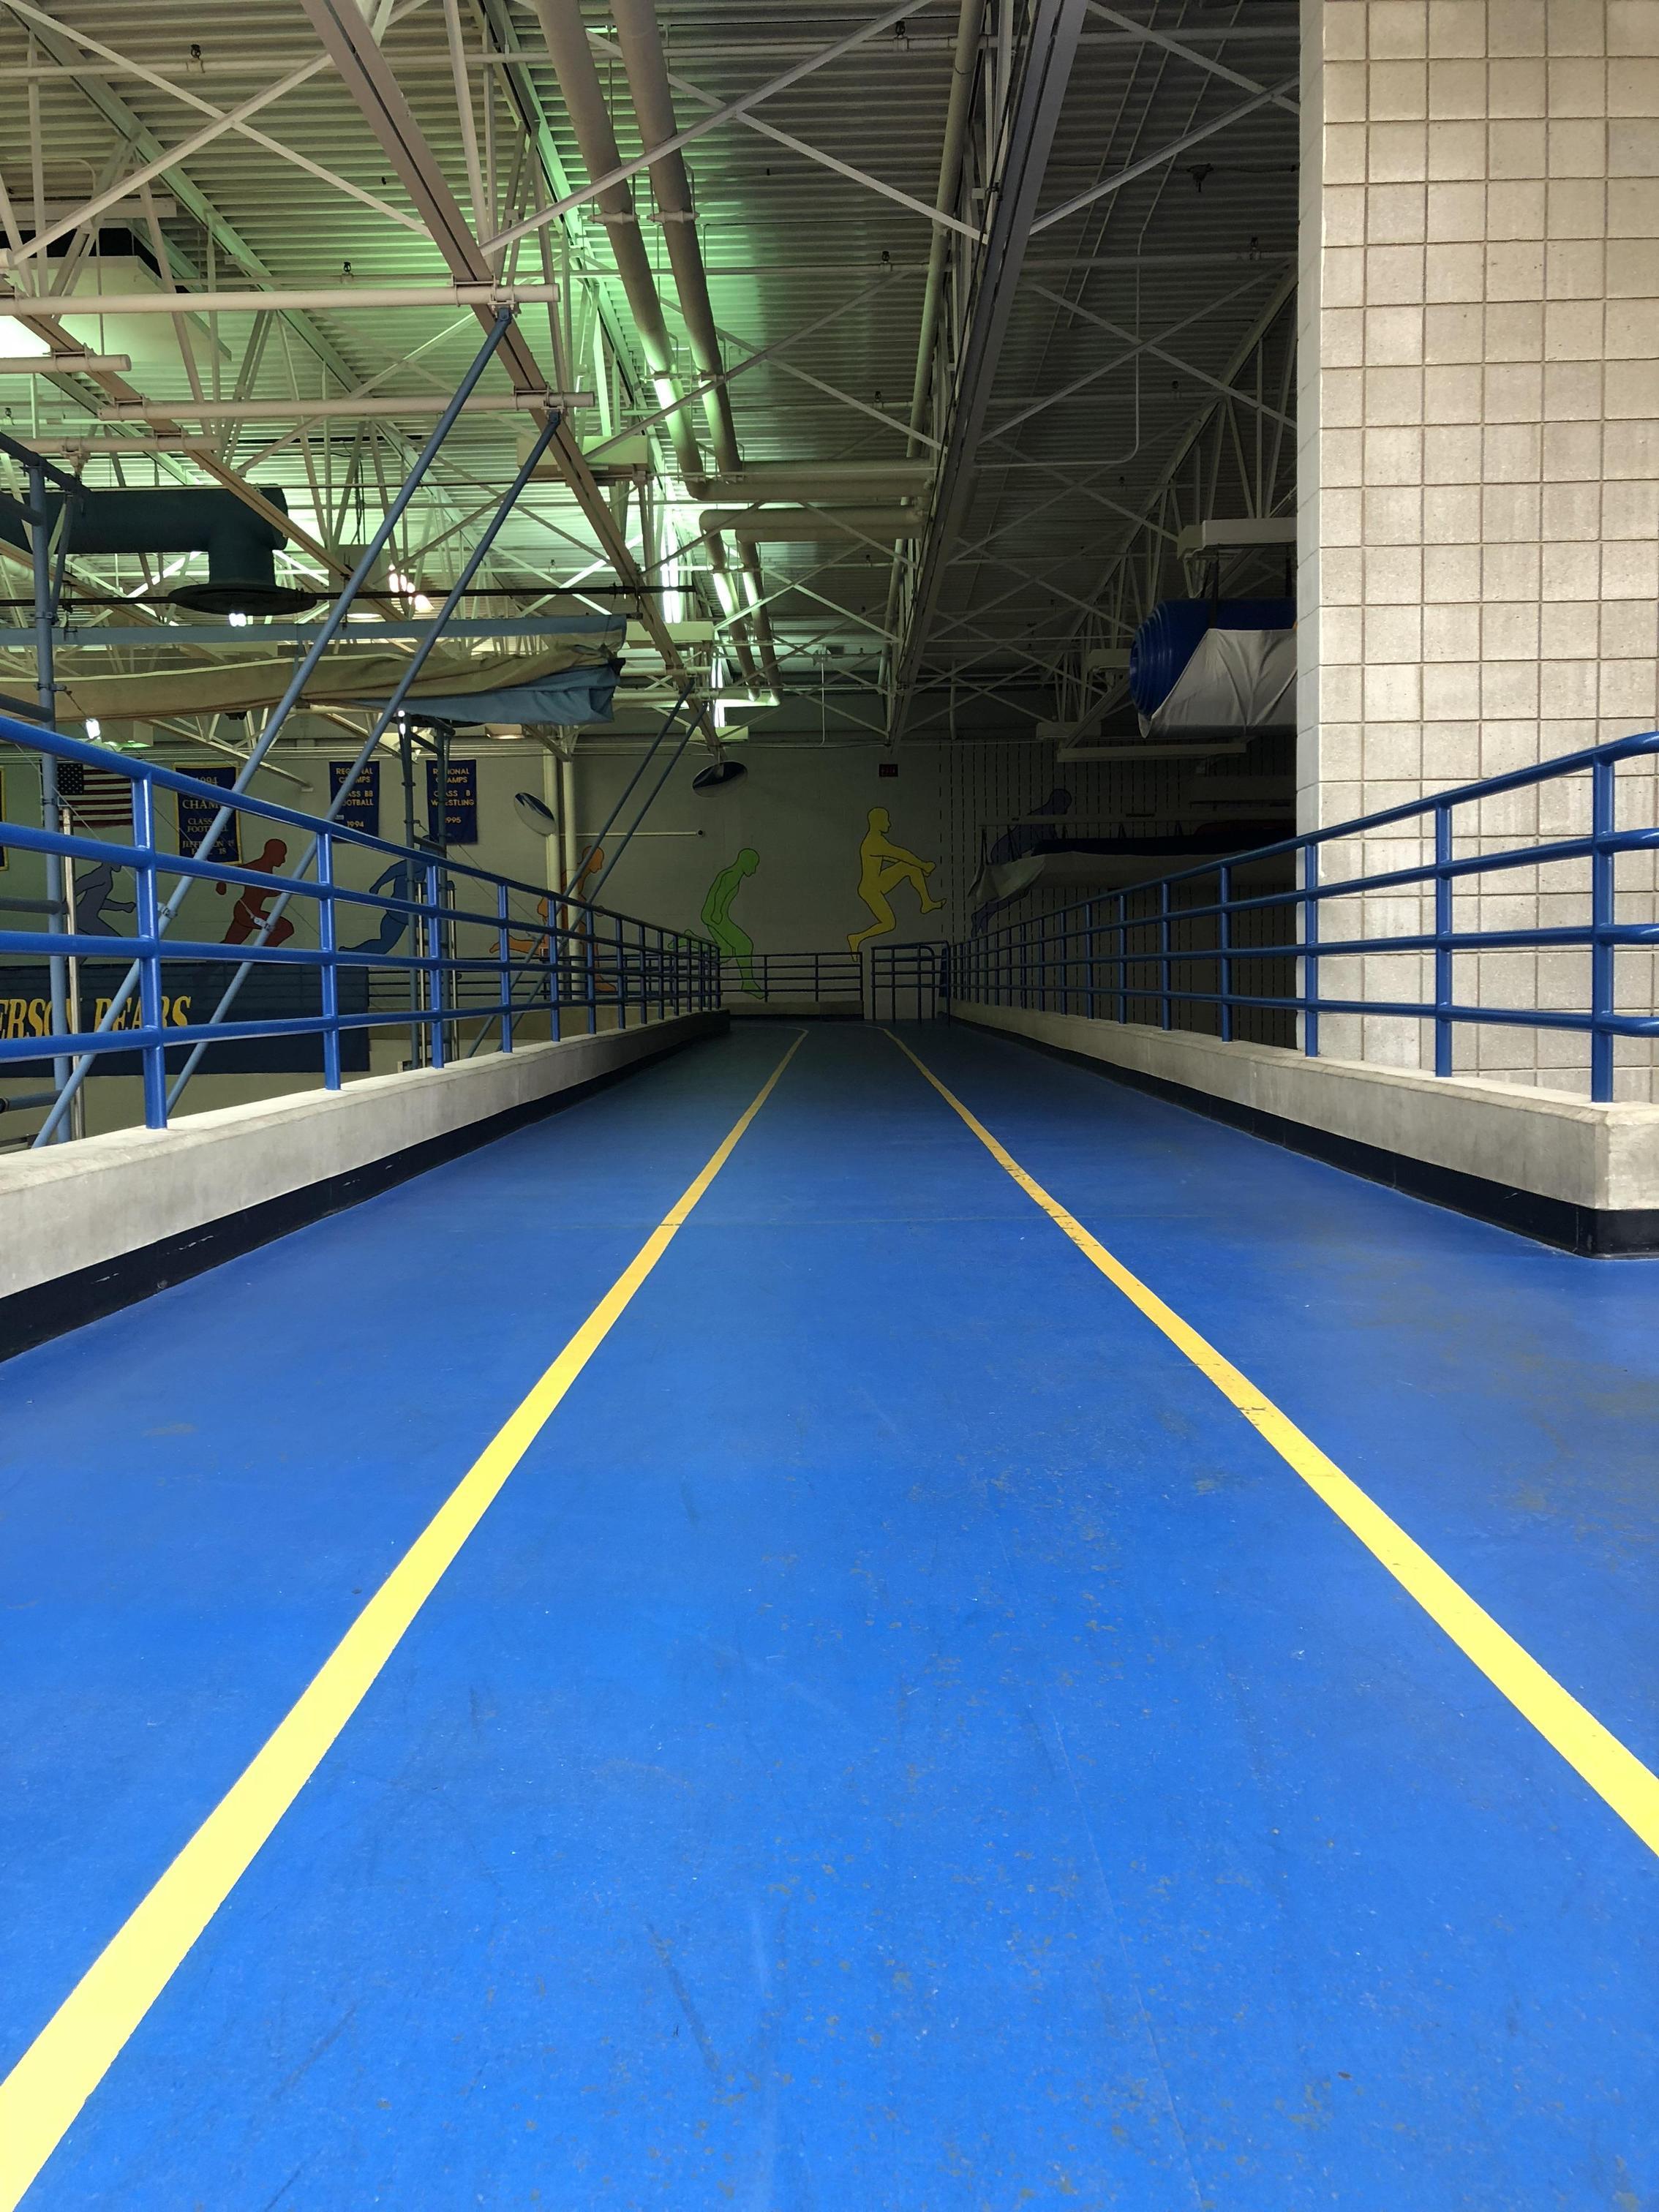 Elevated 3 lane track